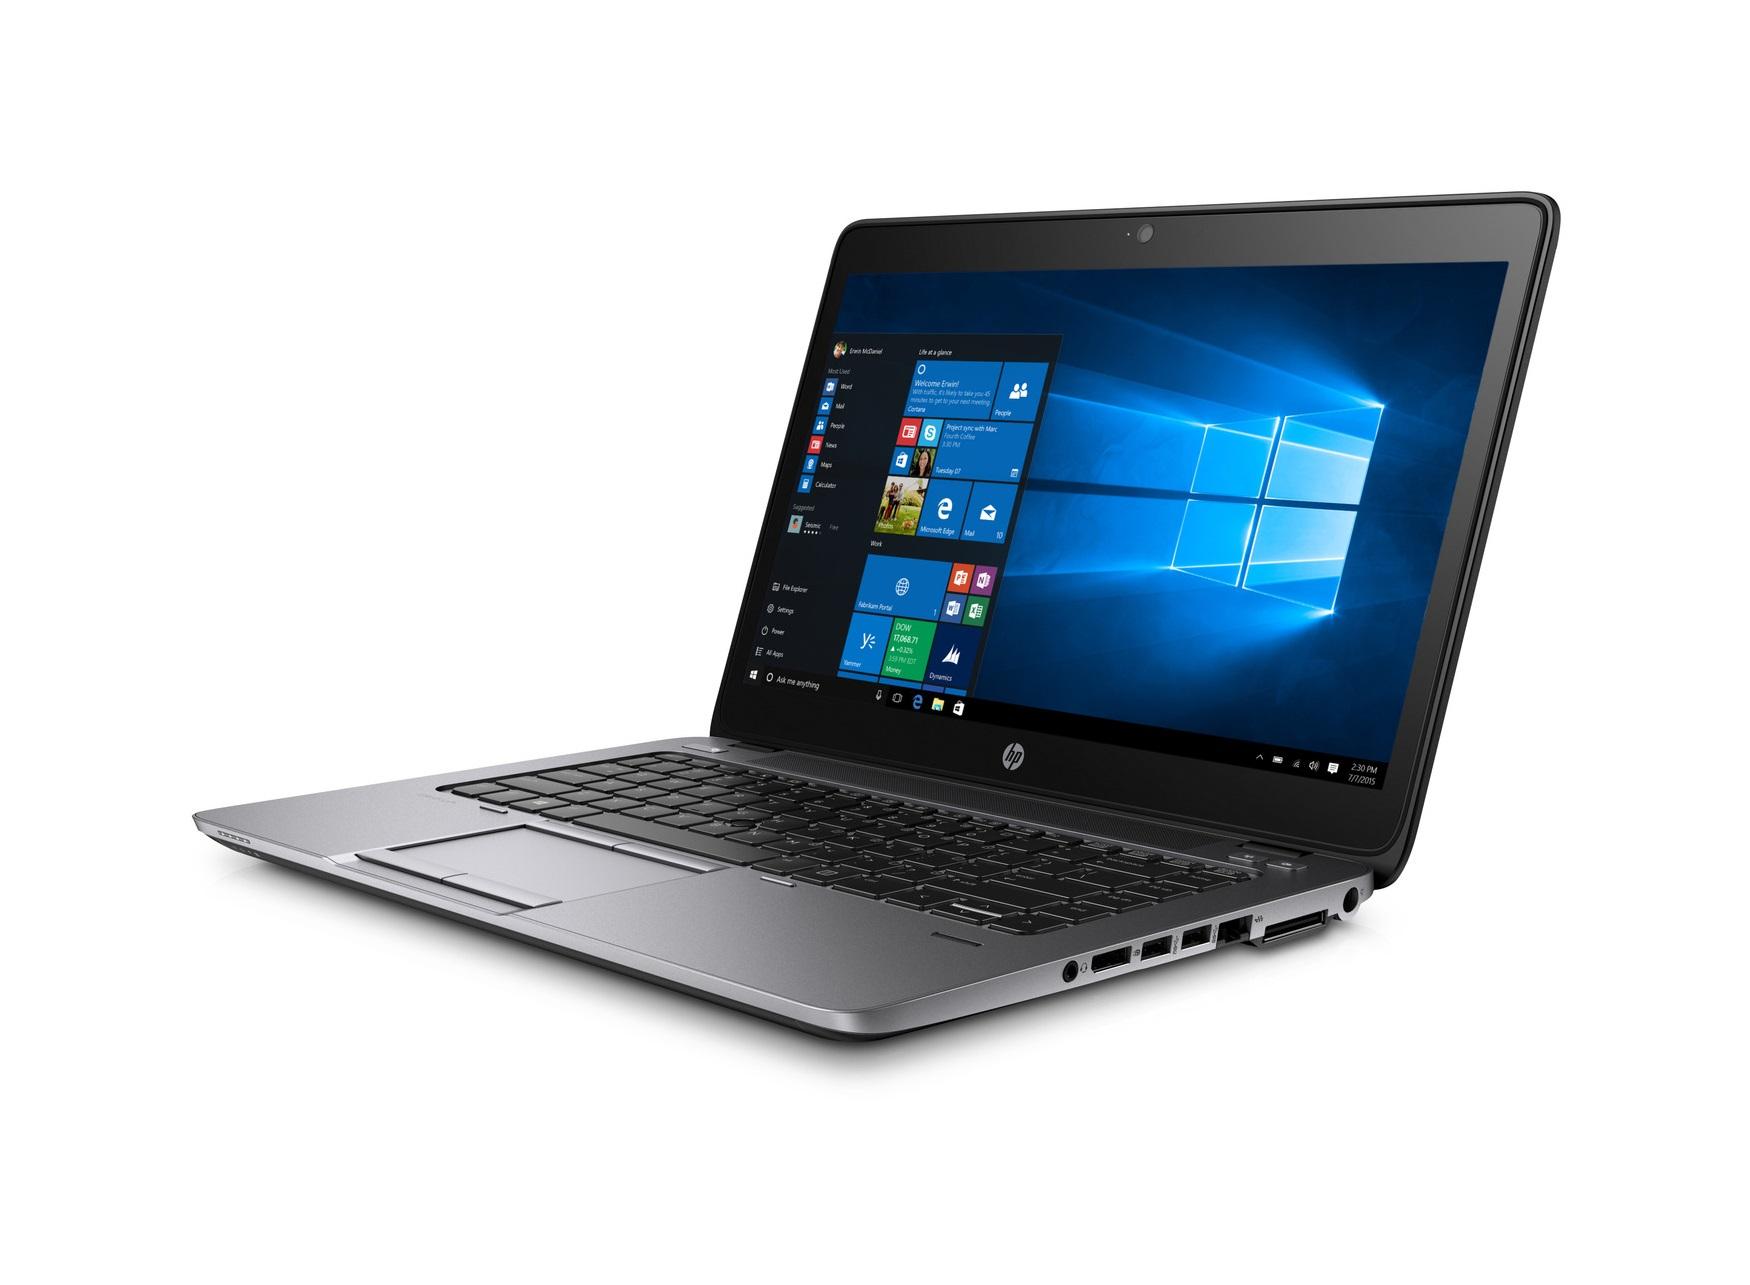 HP 840 G2 14